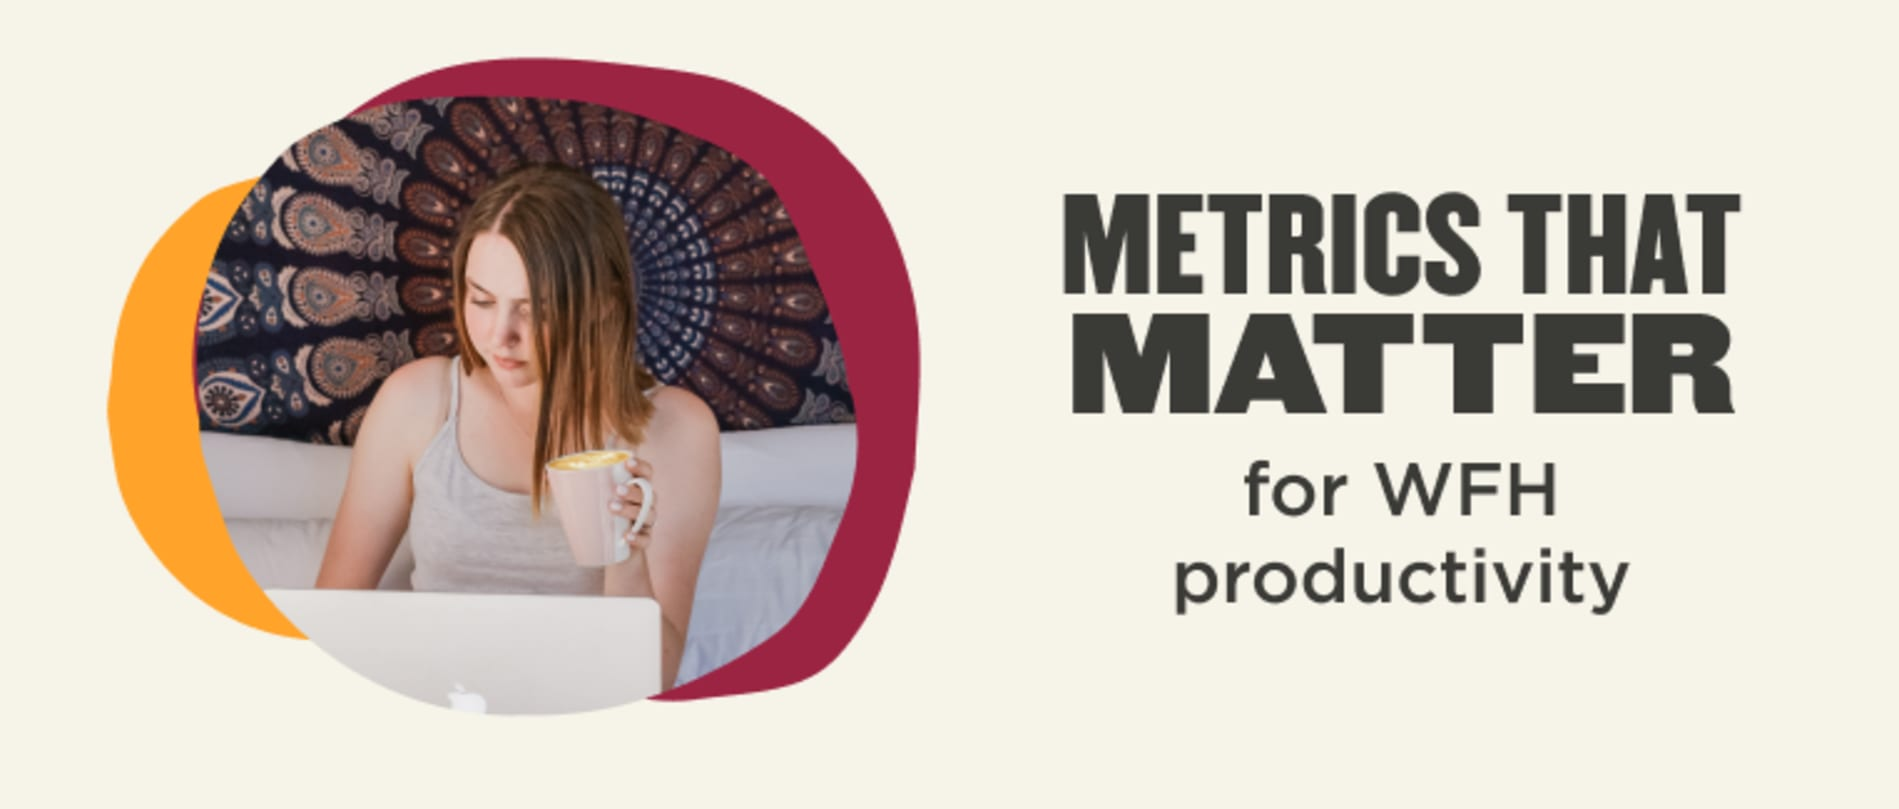 Metrics that matter (WFH productivity)